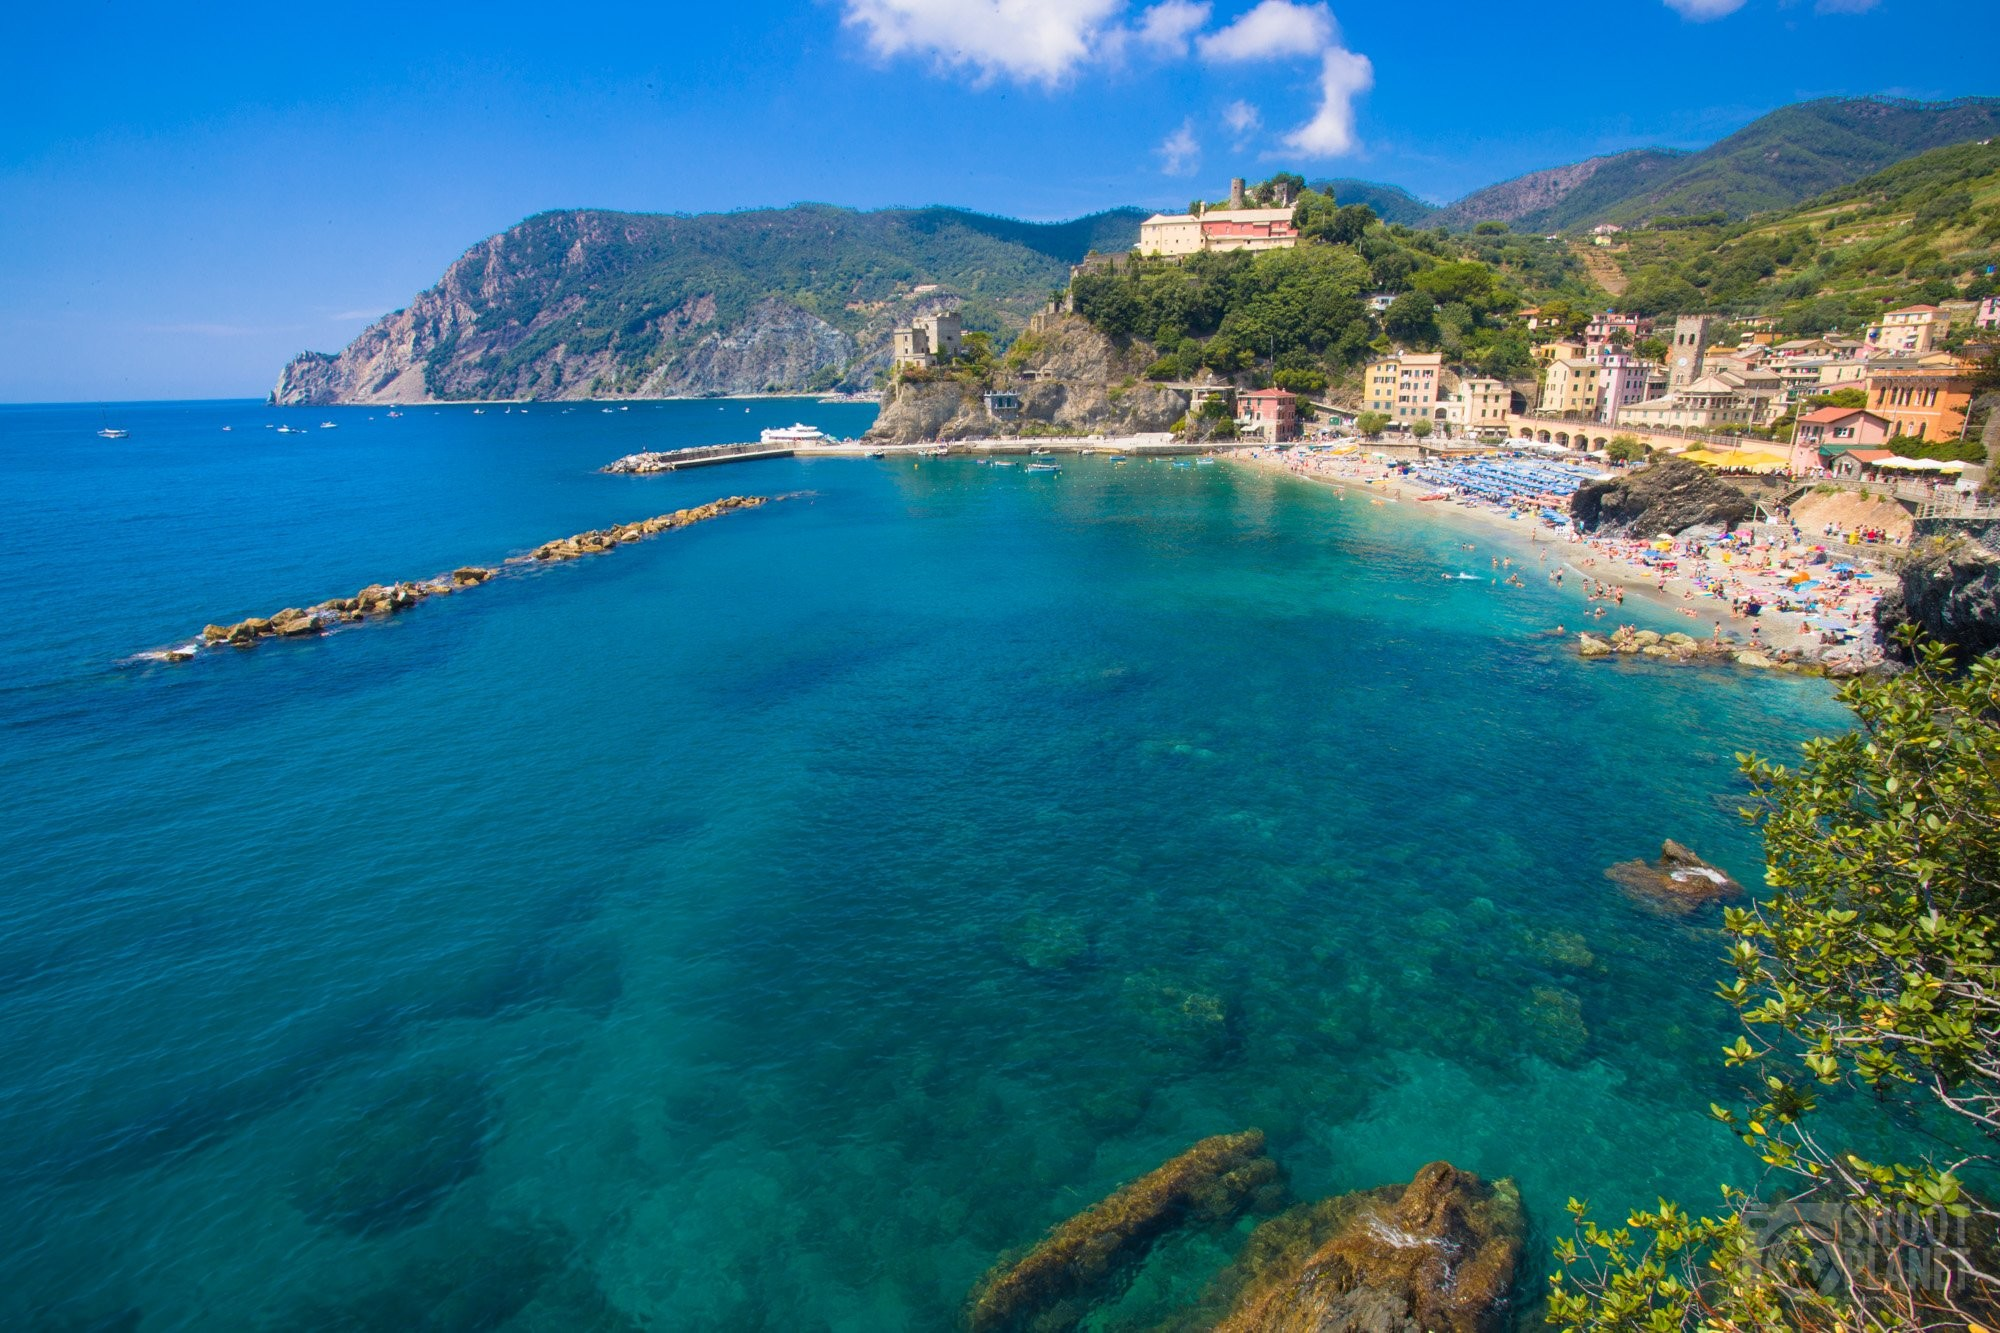 Monterosso aerial view in Cinque Terre Italy